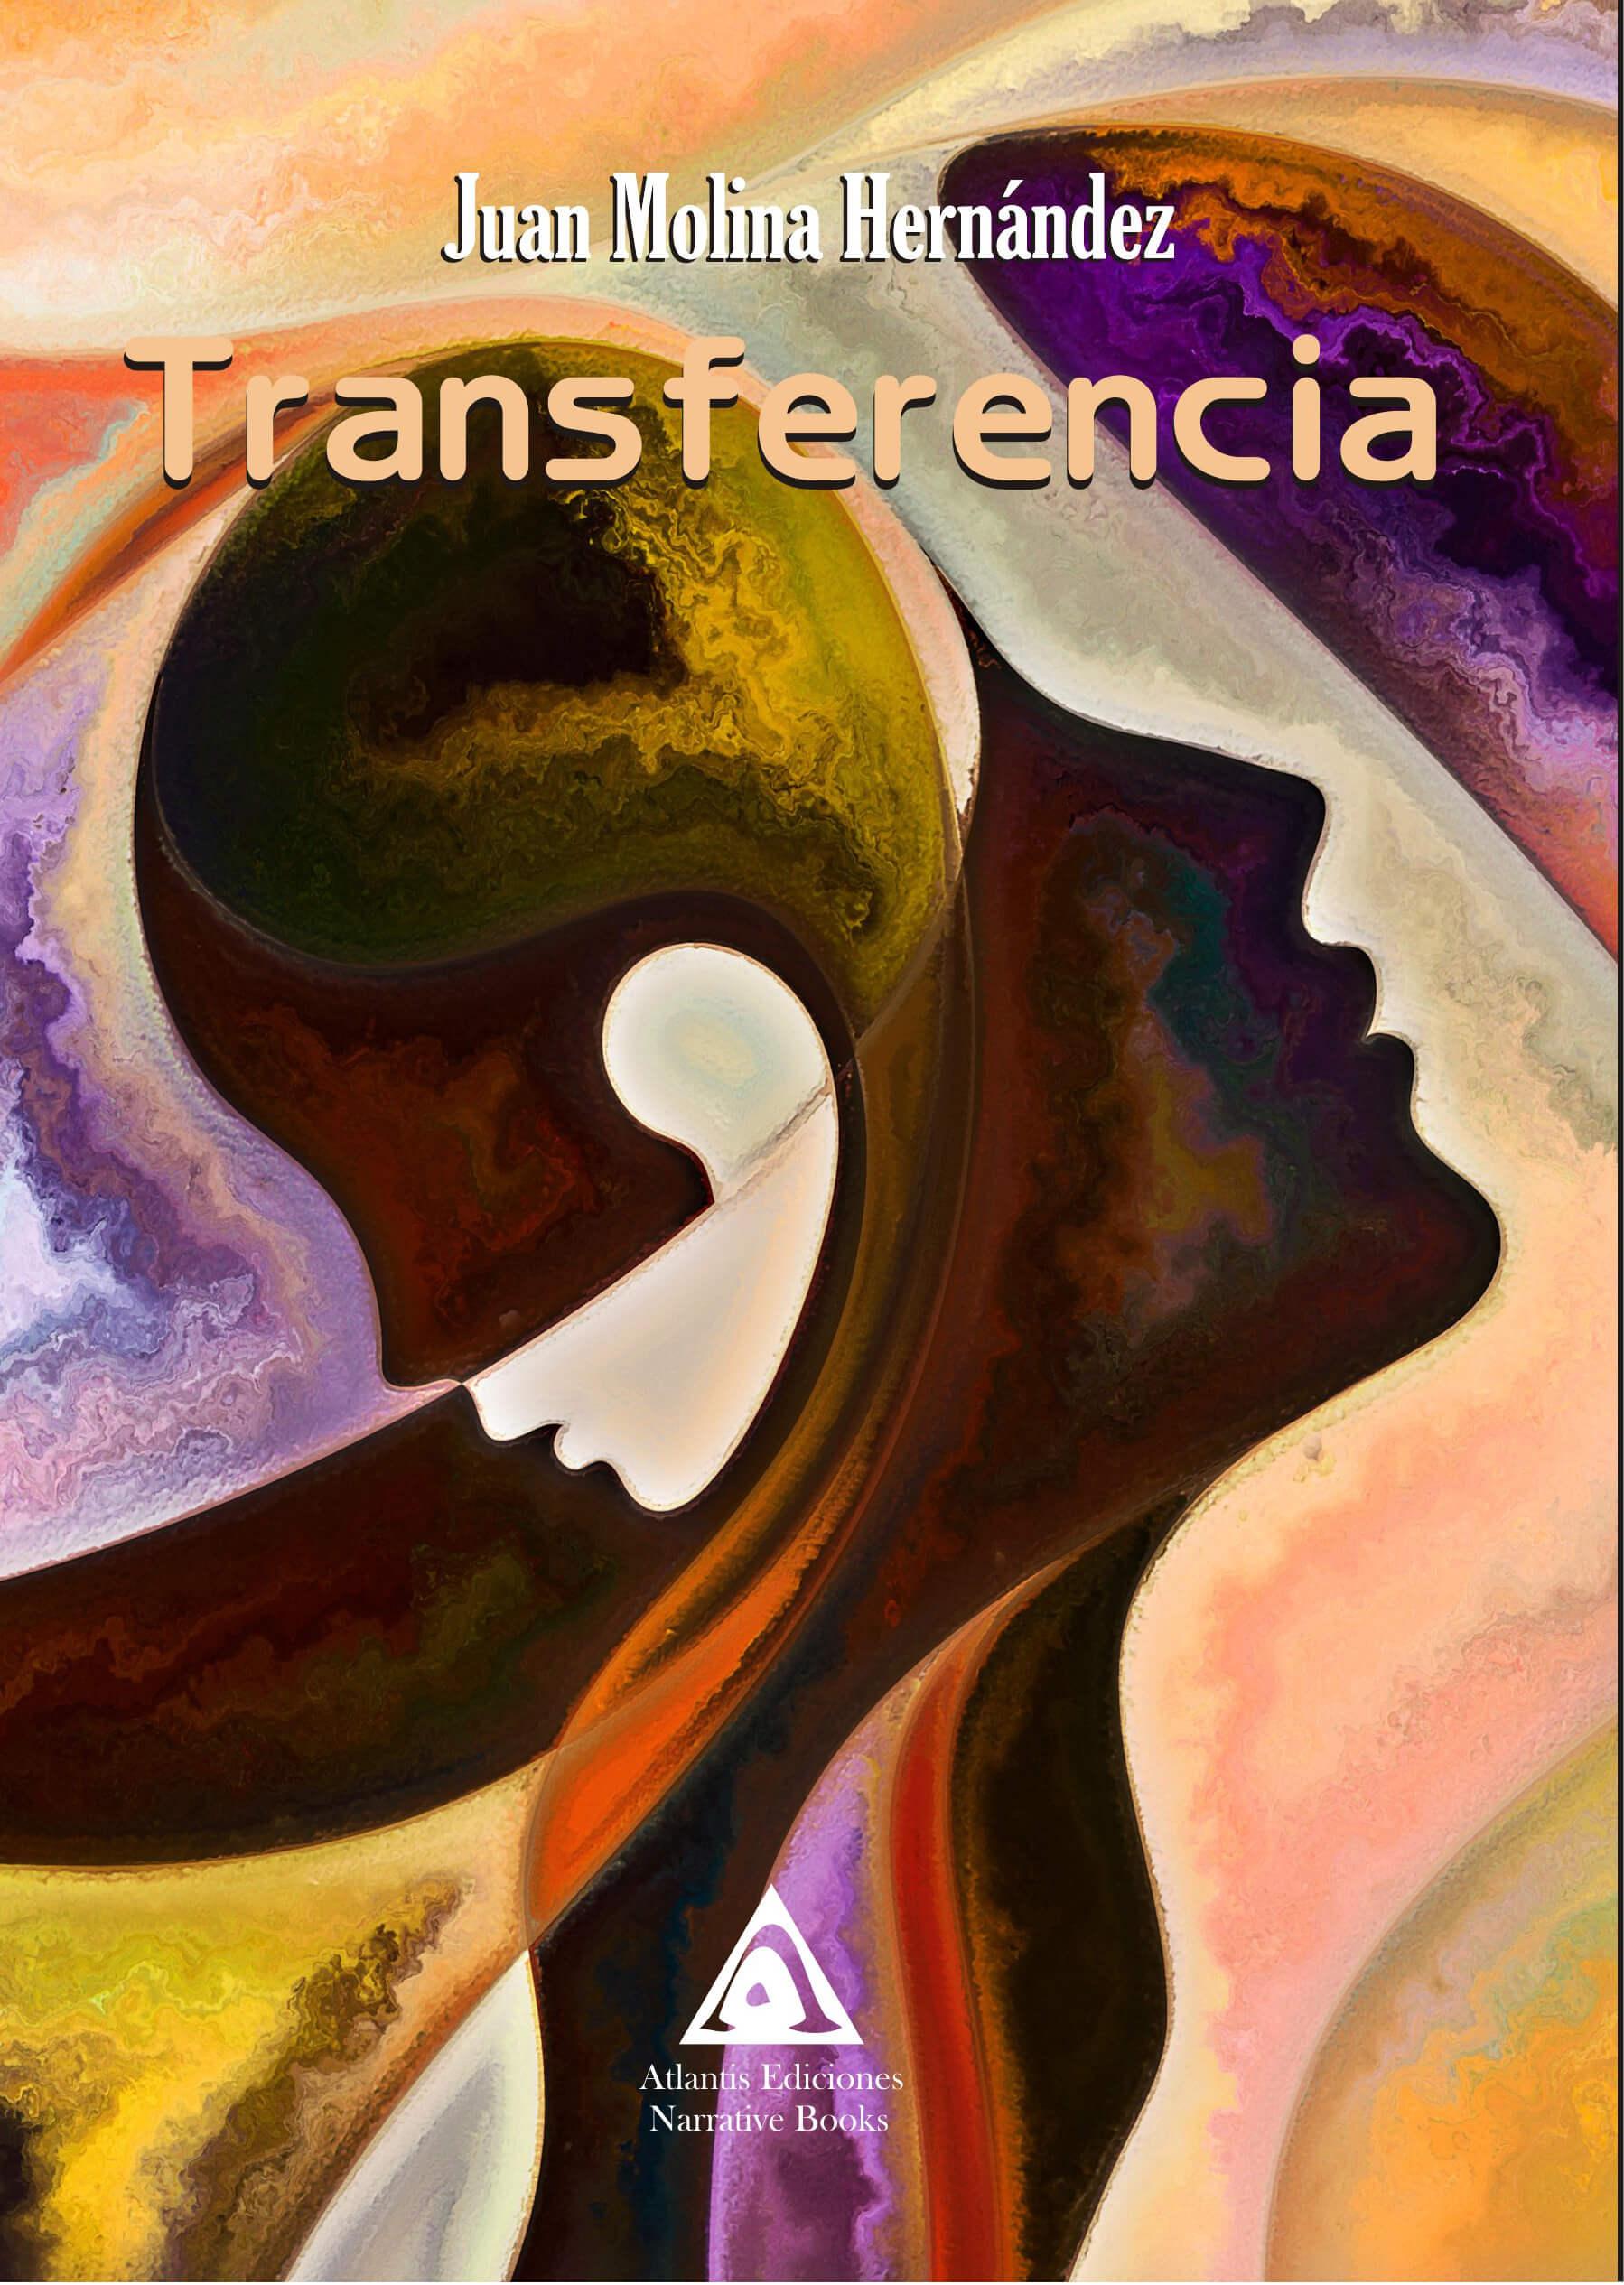 Transferencia, una obra de Juan Molina Hernández